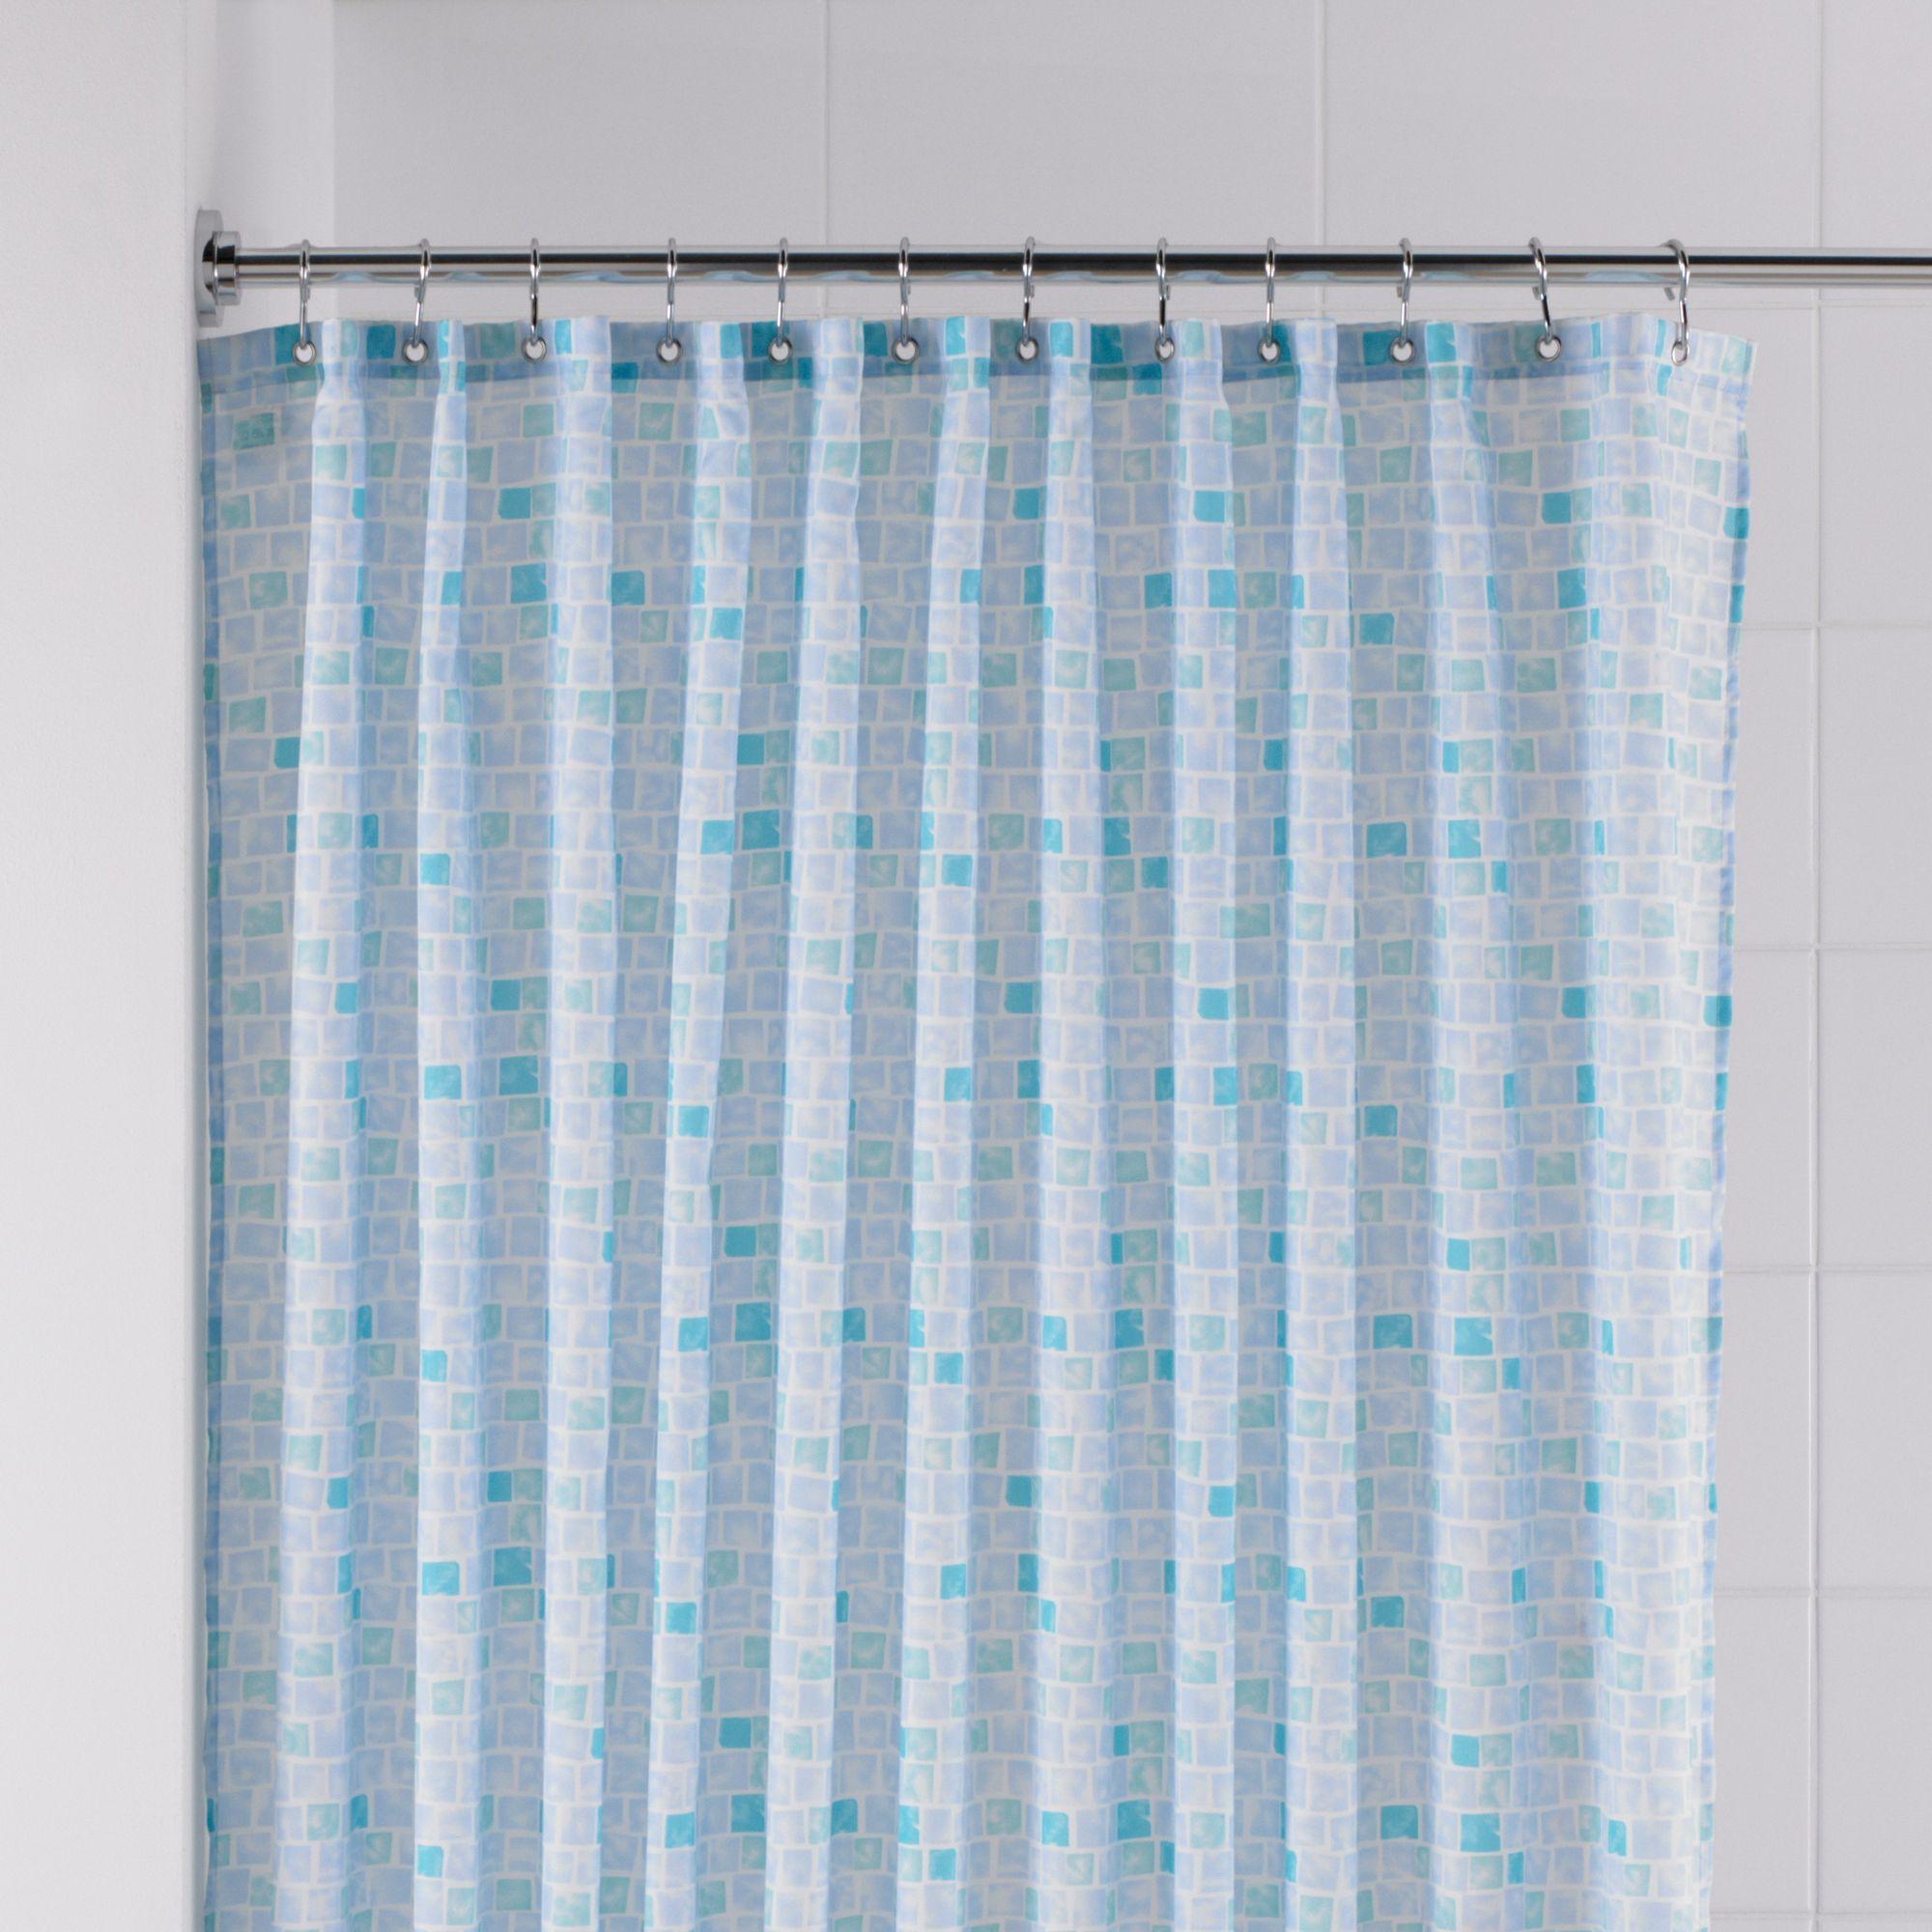 B&Q Blue Mosaic Shower curtain (L)1800 mm | Departments | DIY at B&Q